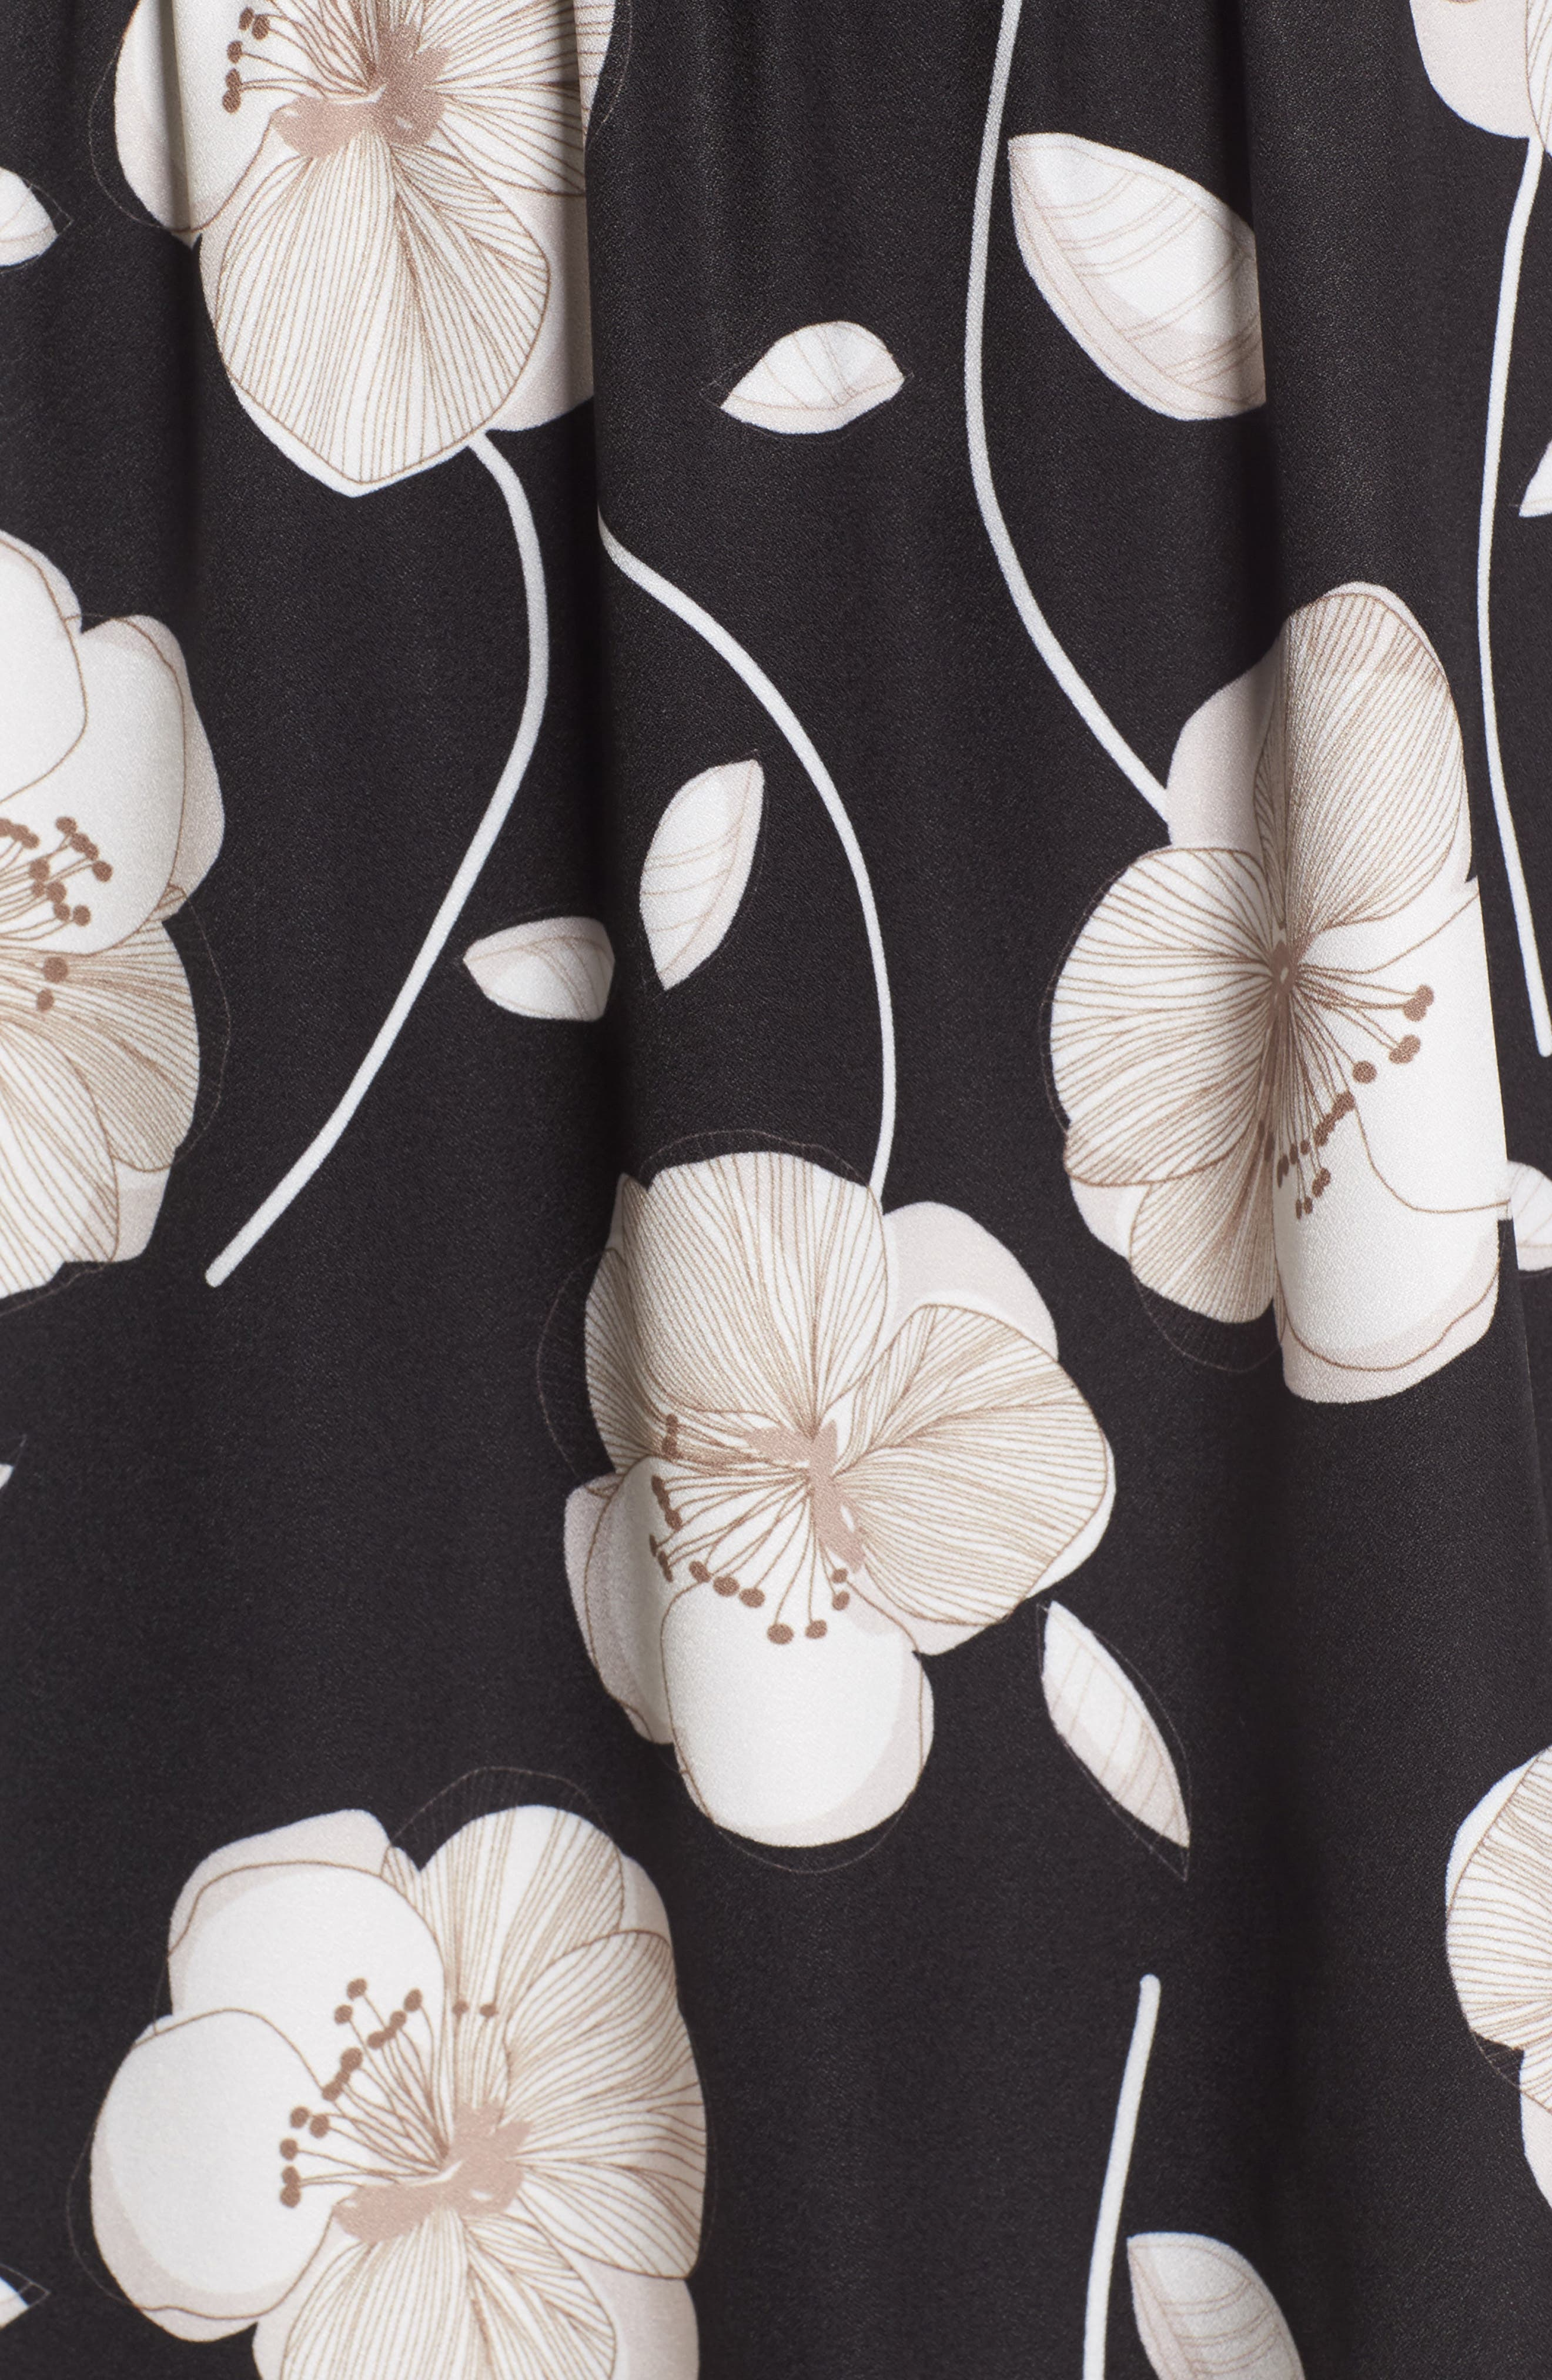 Cold Shoulder Asymmetrical Maxi Dress,                             Alternate thumbnail 5, color,                             001